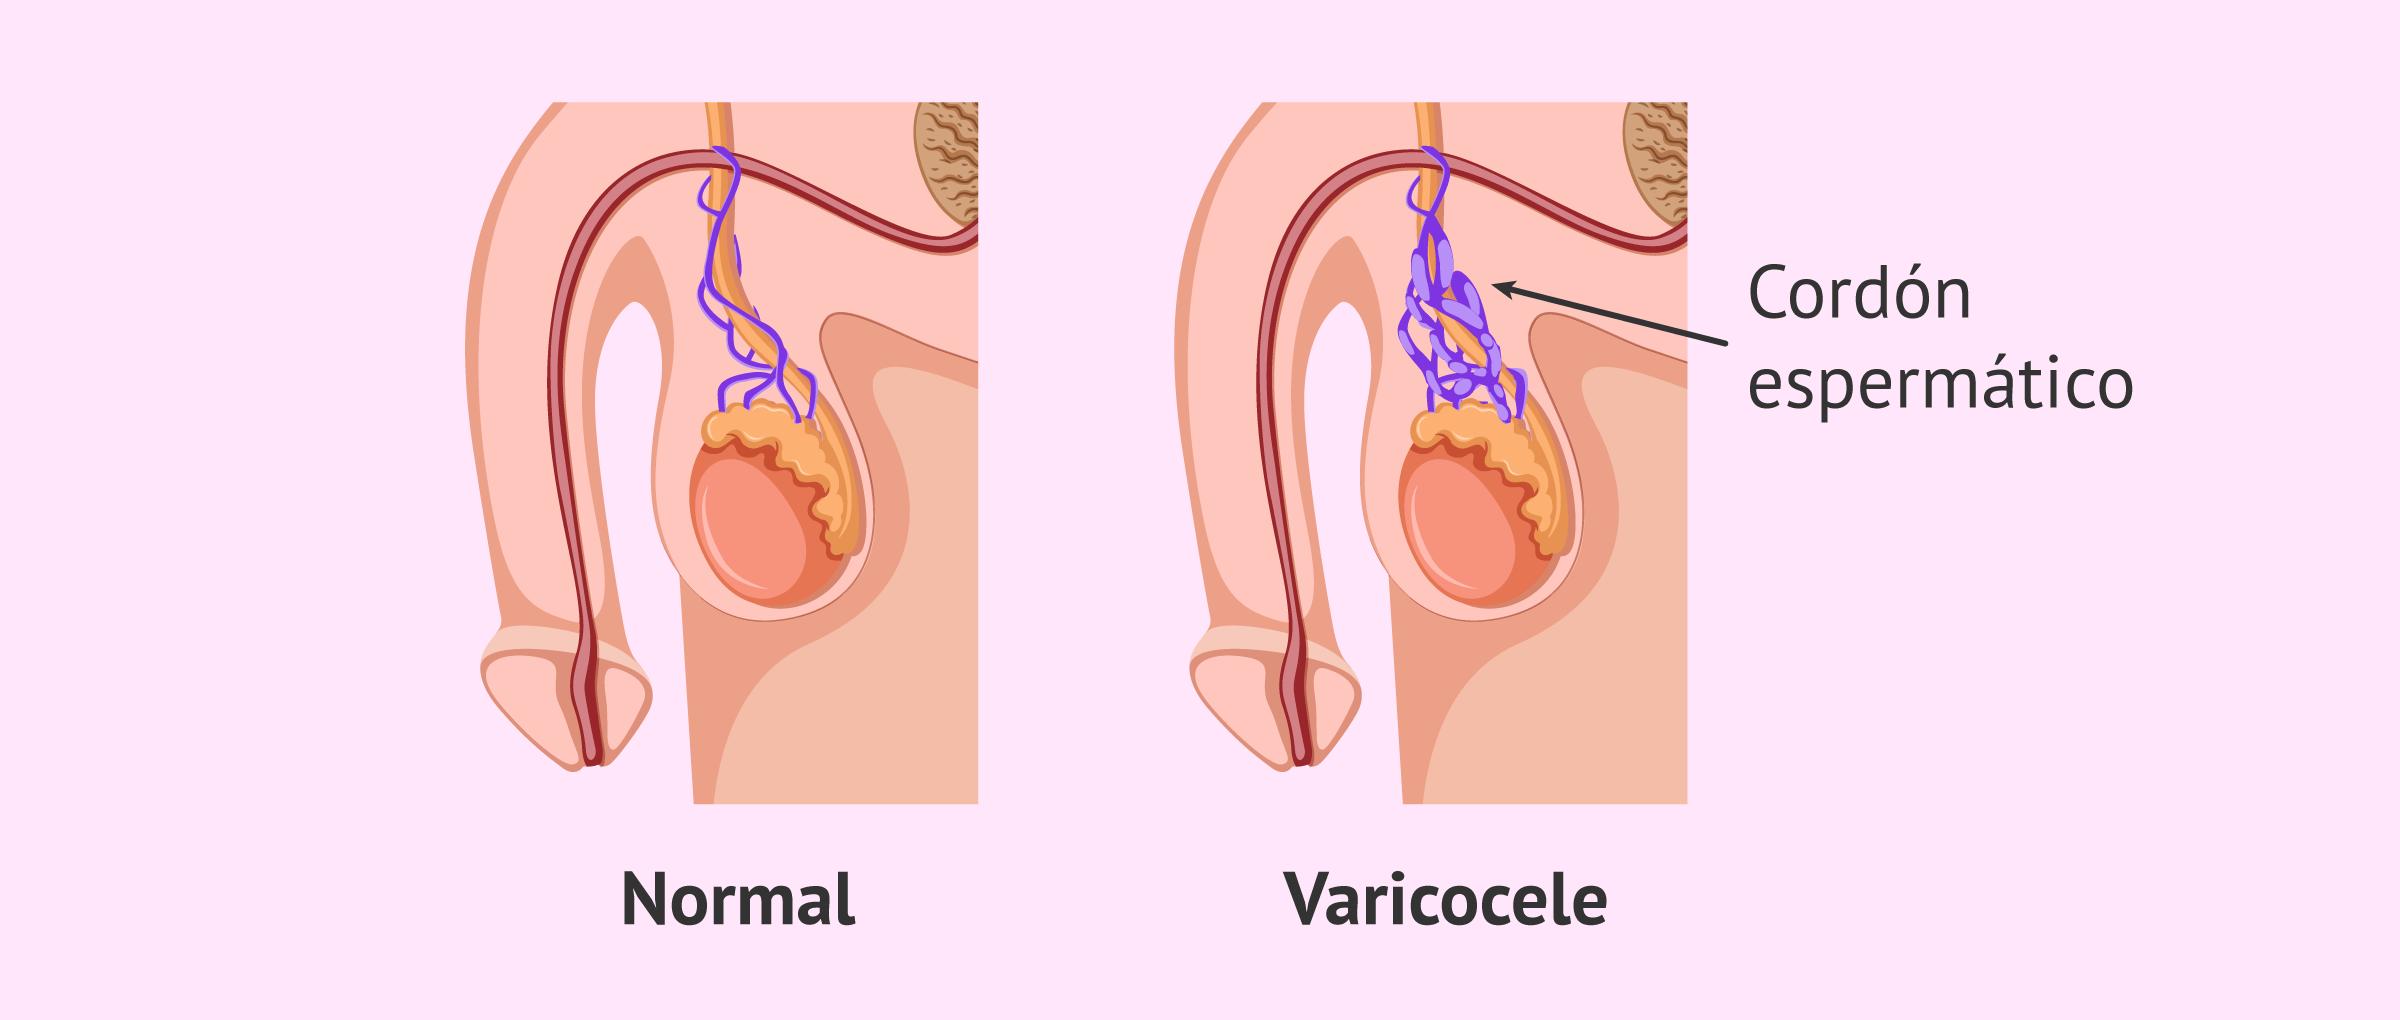 Varicocele y azoospermia